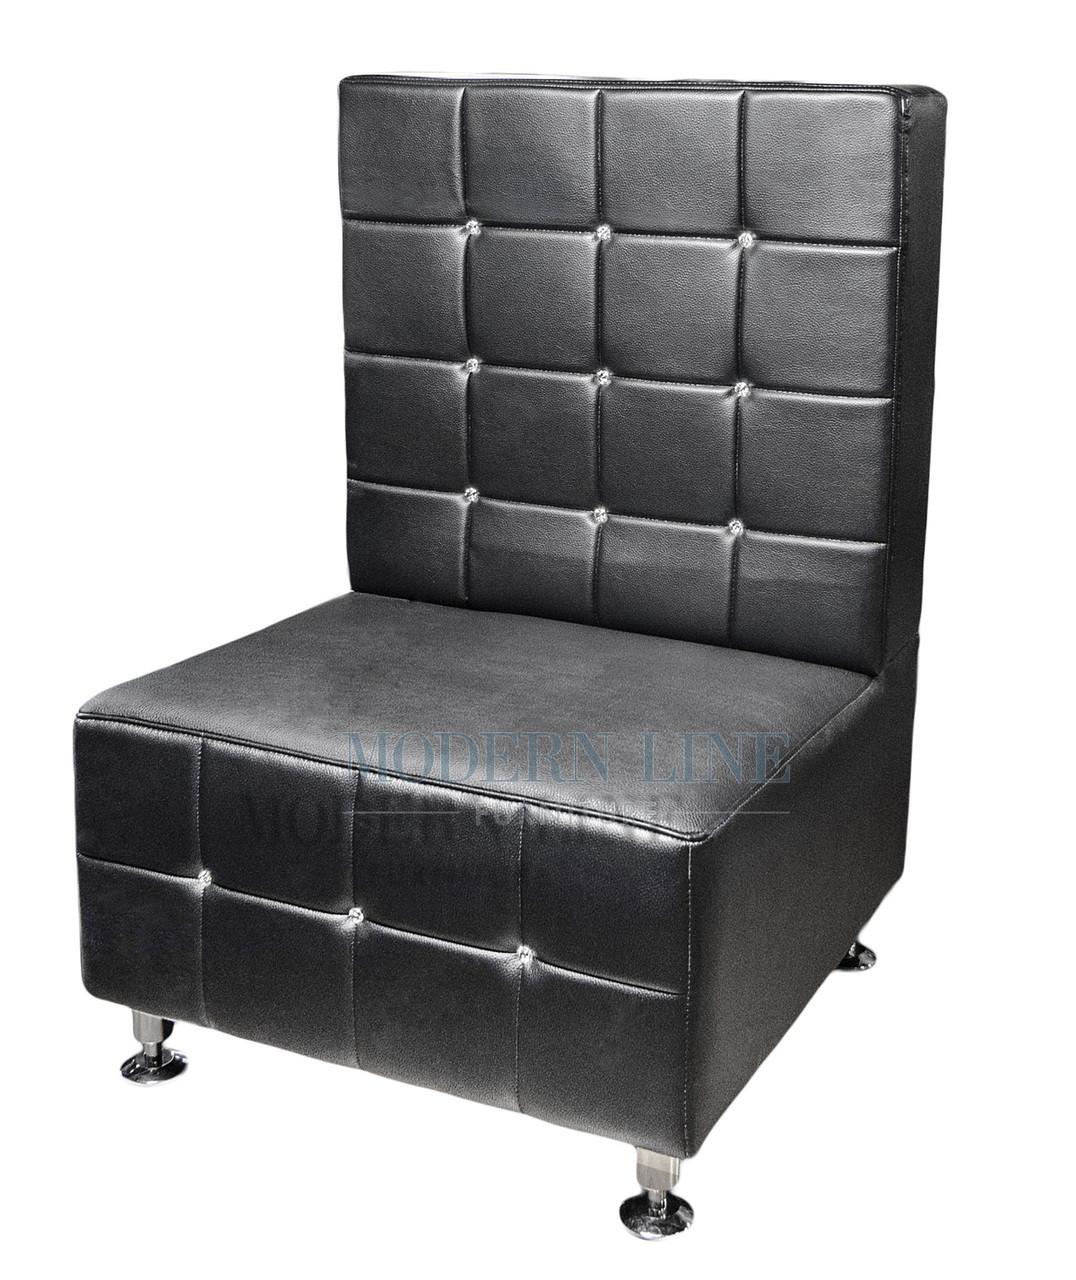 SWAROVSKI Crystal Tufted Modern Modular Black Leather Armless Chair (Made  In USA)